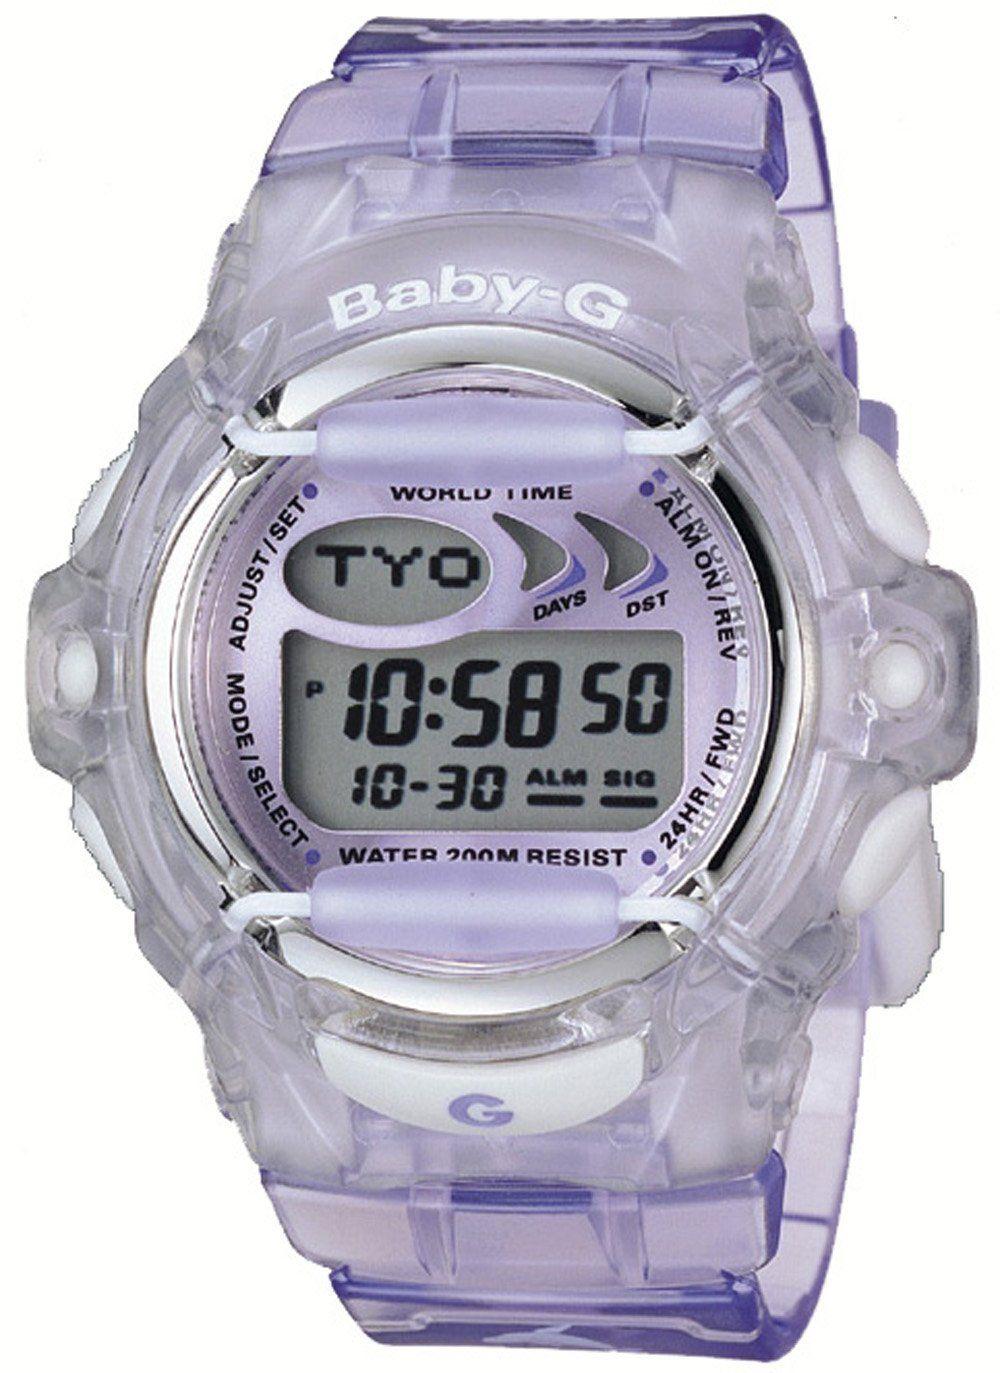 Casio Women S Bg169 6v Baby G Purple Jelly Shock Resistant Sports Watch Casio Baby G Watch Womens Sport Watches 1 Casio Baby G Shock Watches Baby G Casio